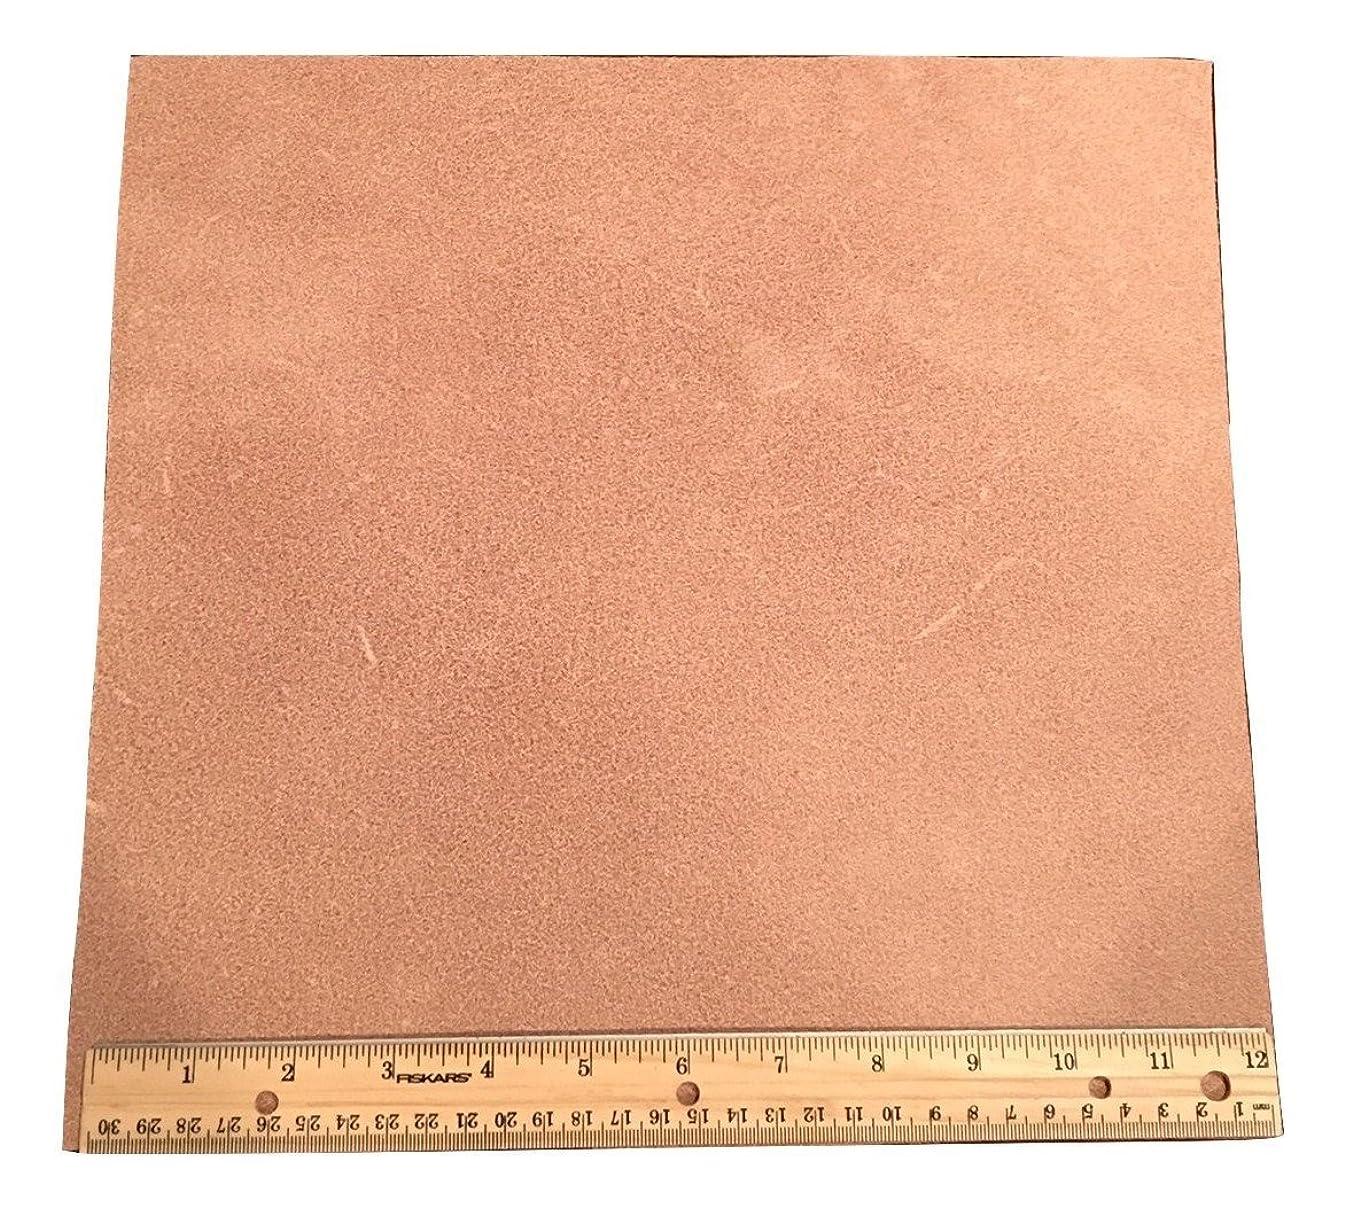 Dangerous Threads Leather Side Veg Tan Splits - Medium Weight- Various Sizes (10 SF (30